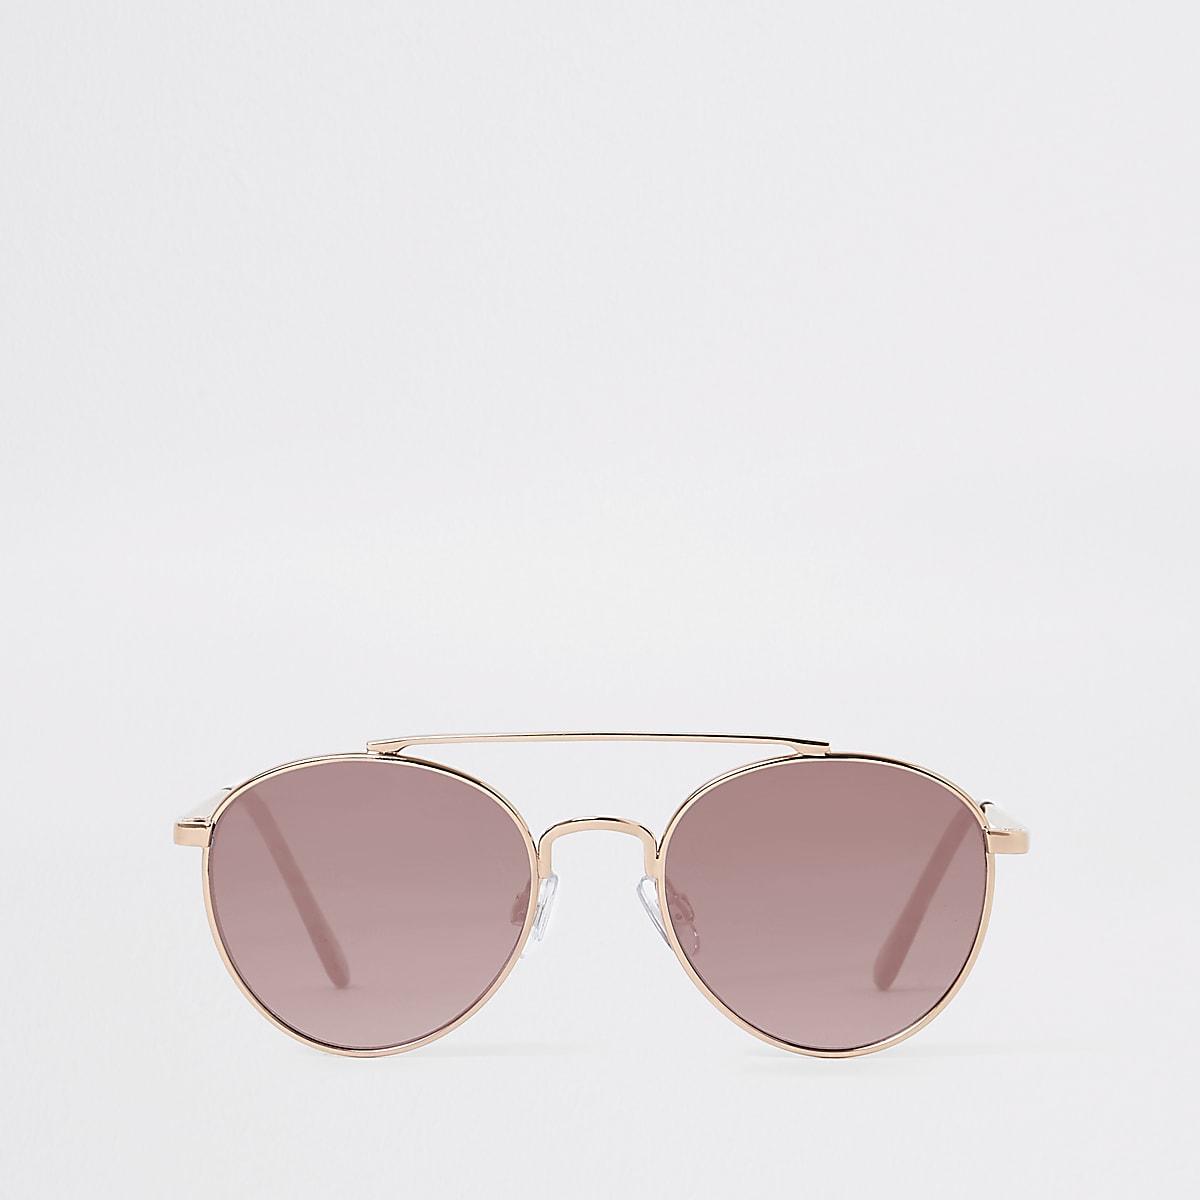 Girls rose gold aviator sunglasses